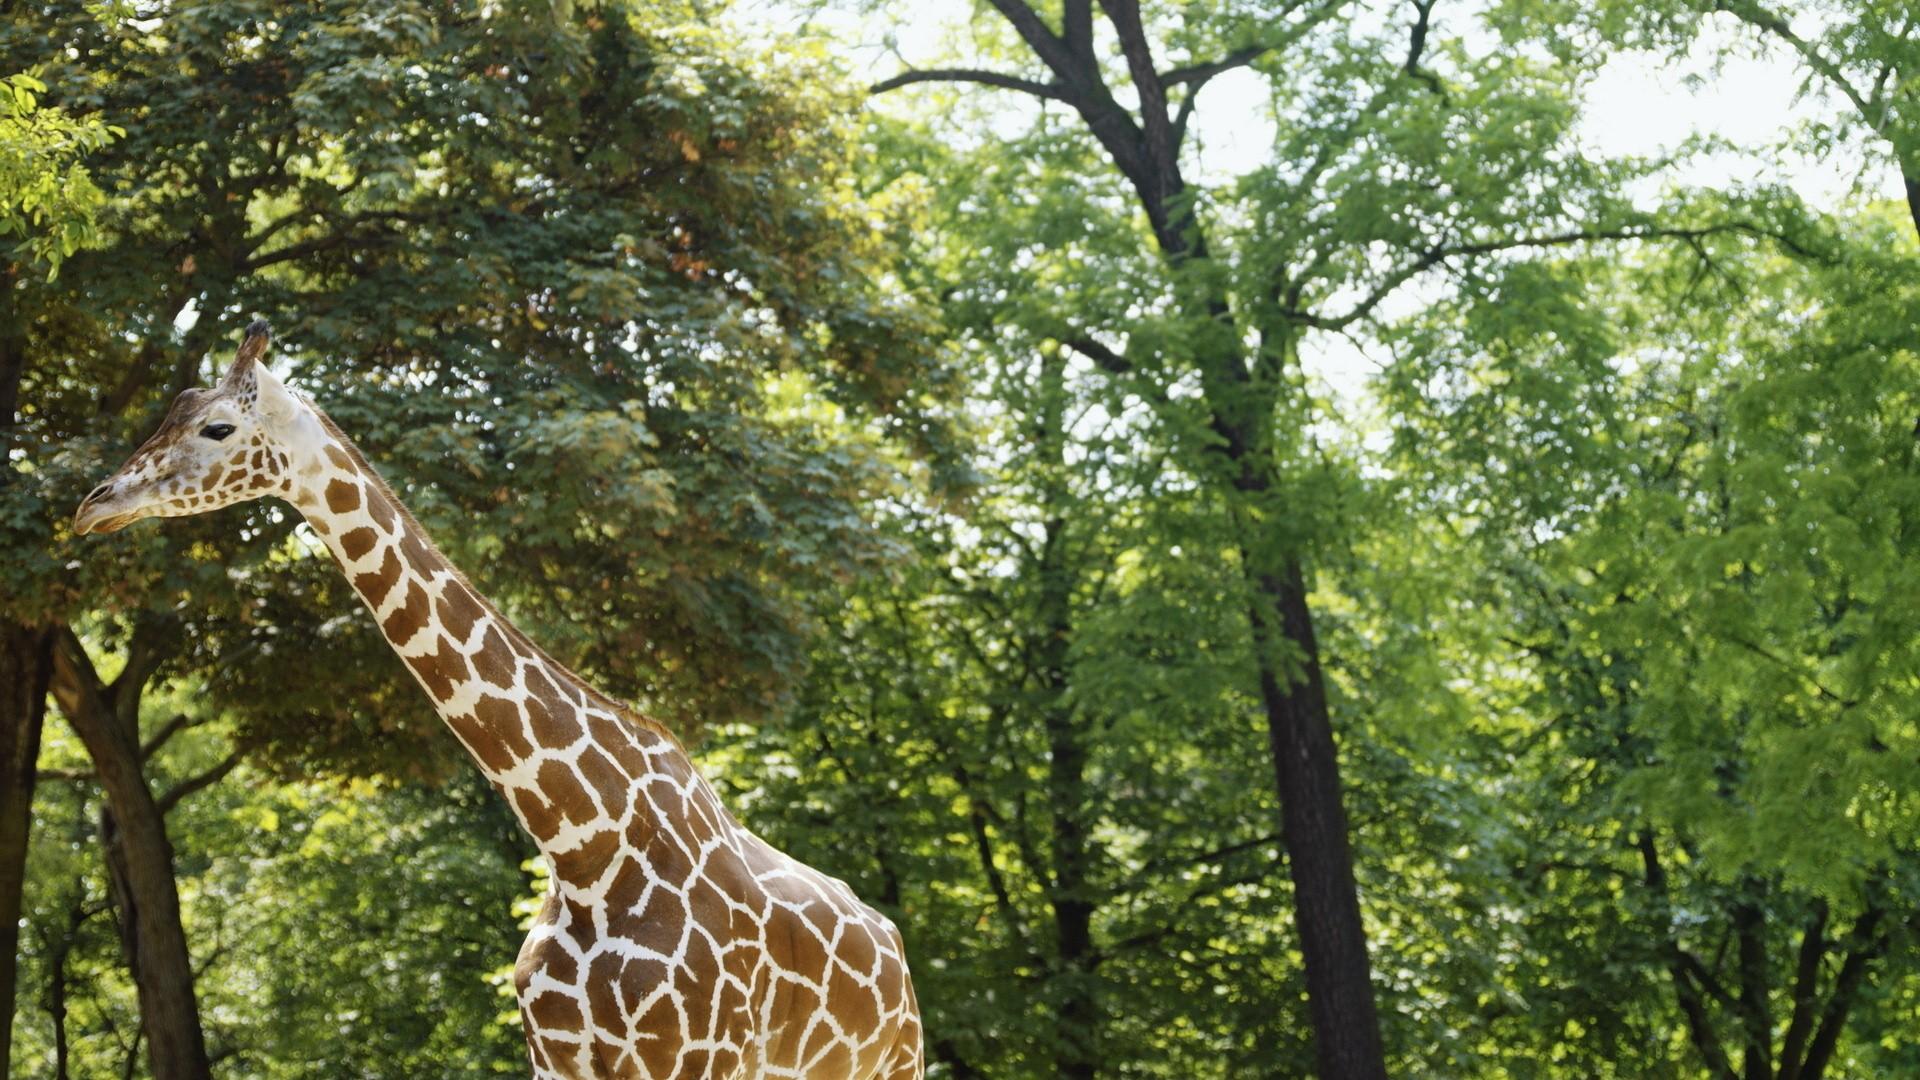 【v粉壁纸】可爱卖萌的长颈鹿壁纸